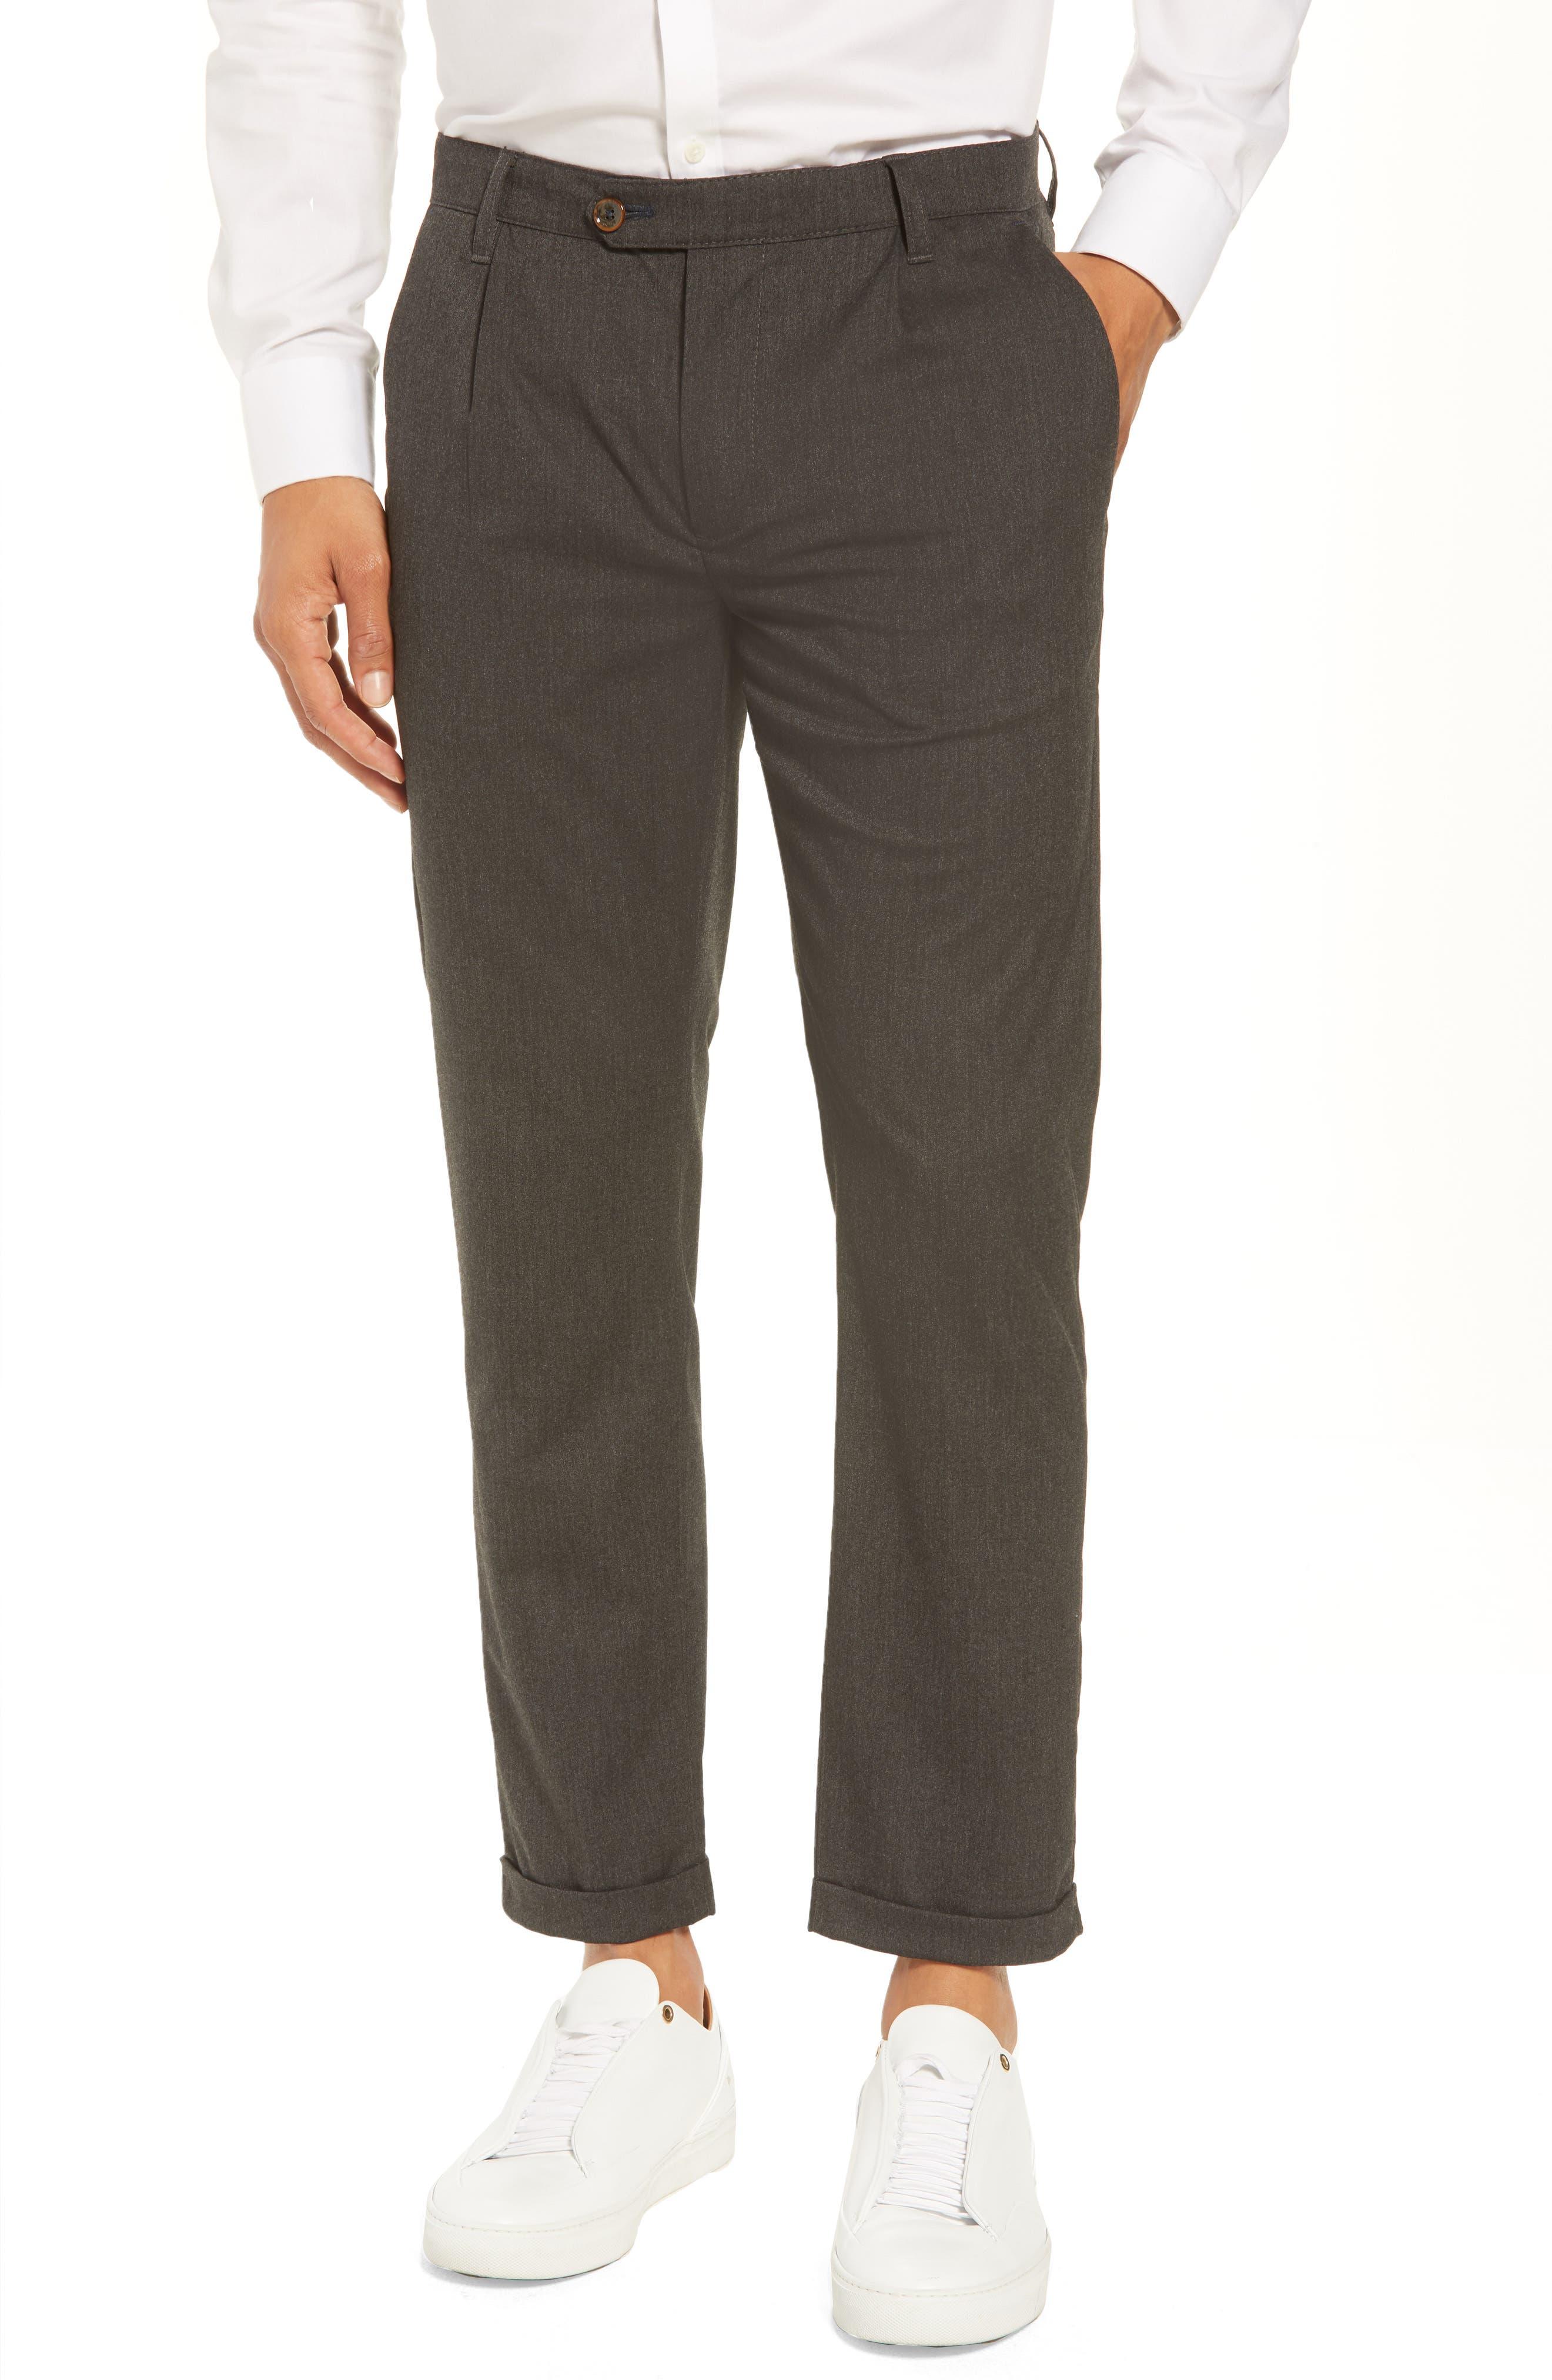 Champi Pleated Cropped Pants,                             Main thumbnail 1, color,                             Black